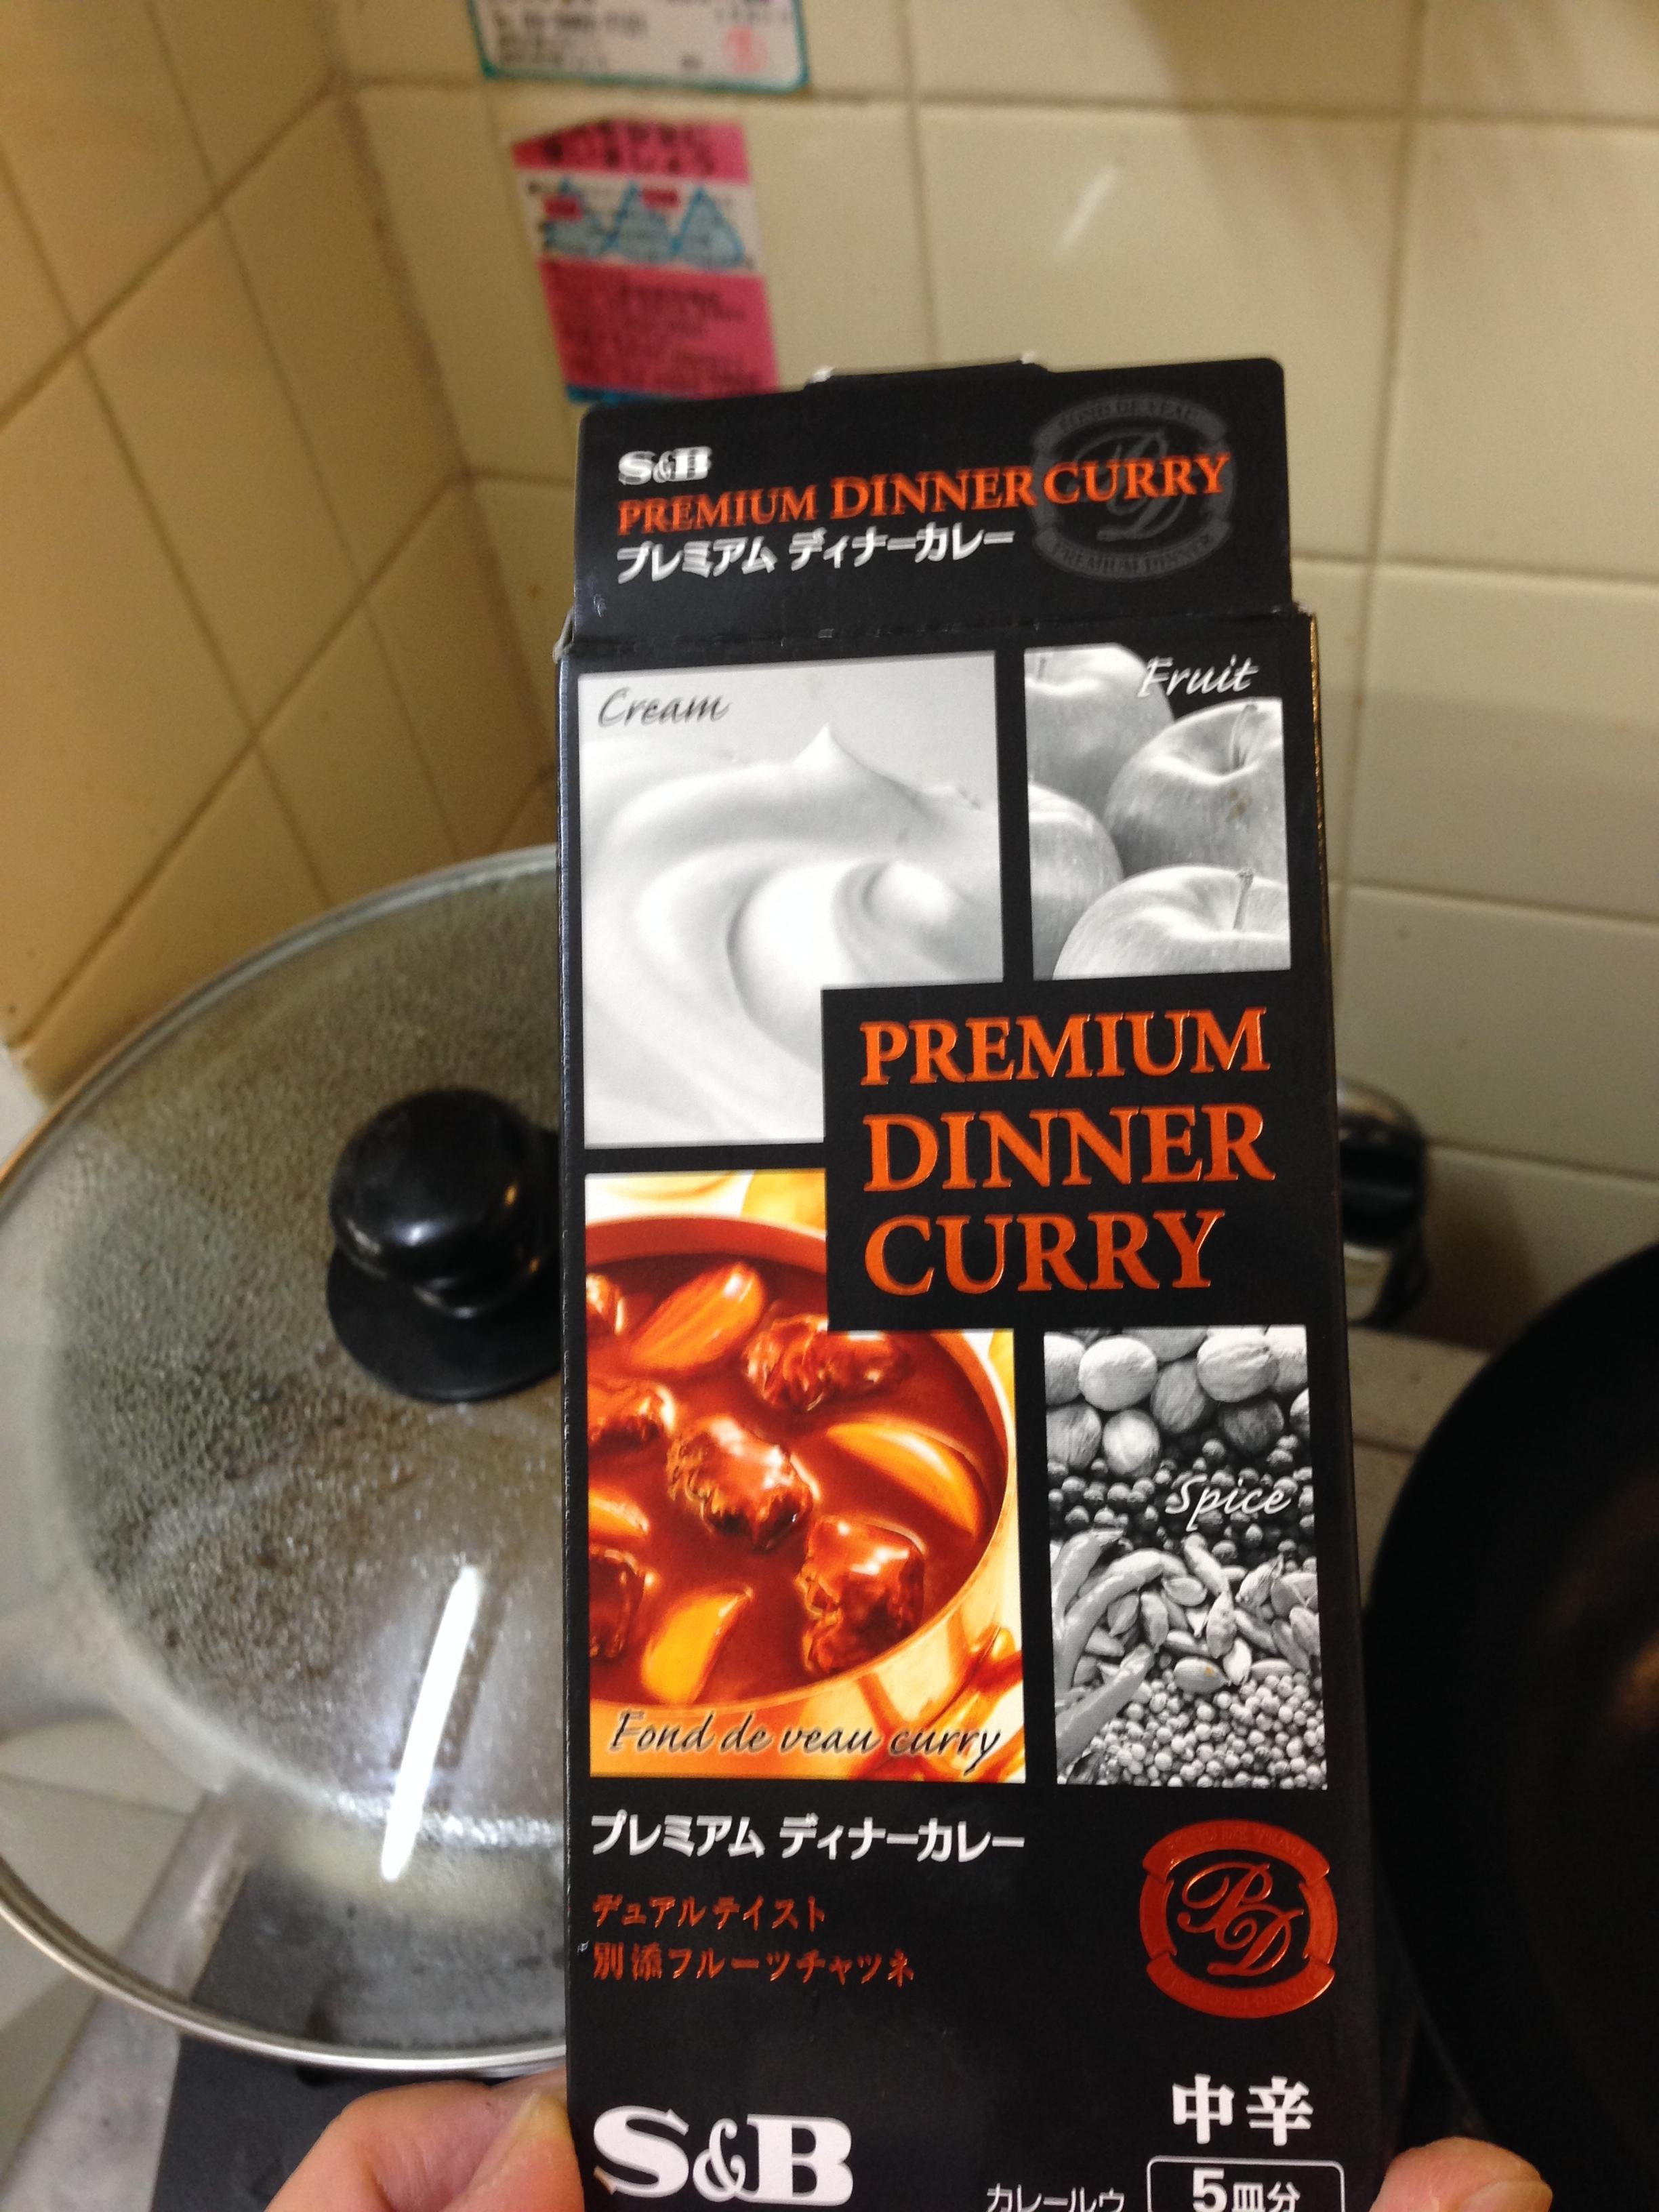 S&B PREMIUM DINNER CURRY